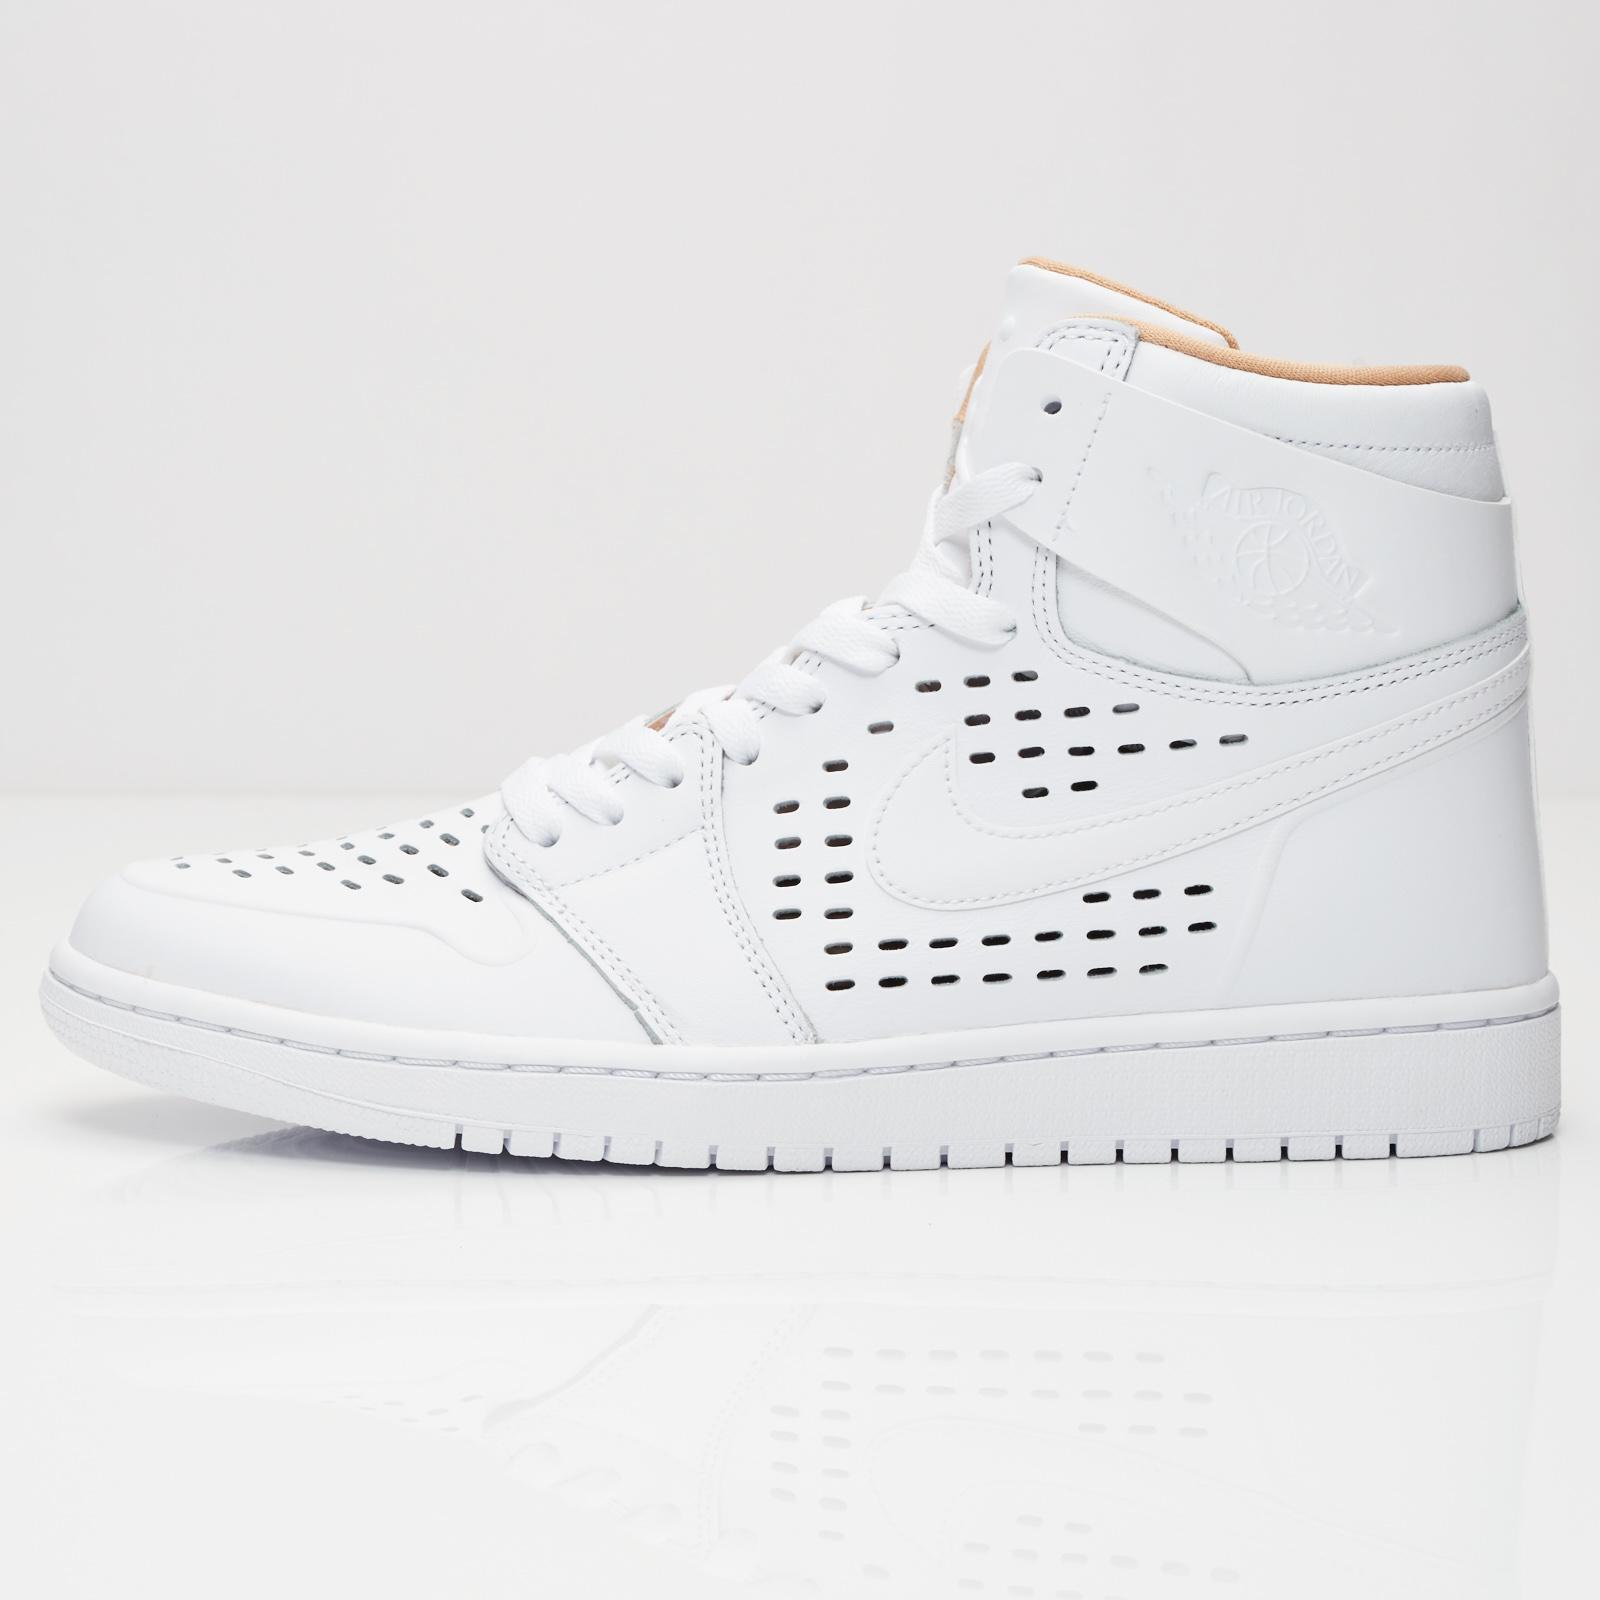 huge discount a93f3 92466 Jordan Brand Air Jordan 1 Retro High - 845018-142 - Sneakersnstuff    sneakers   streetwear online since 1999